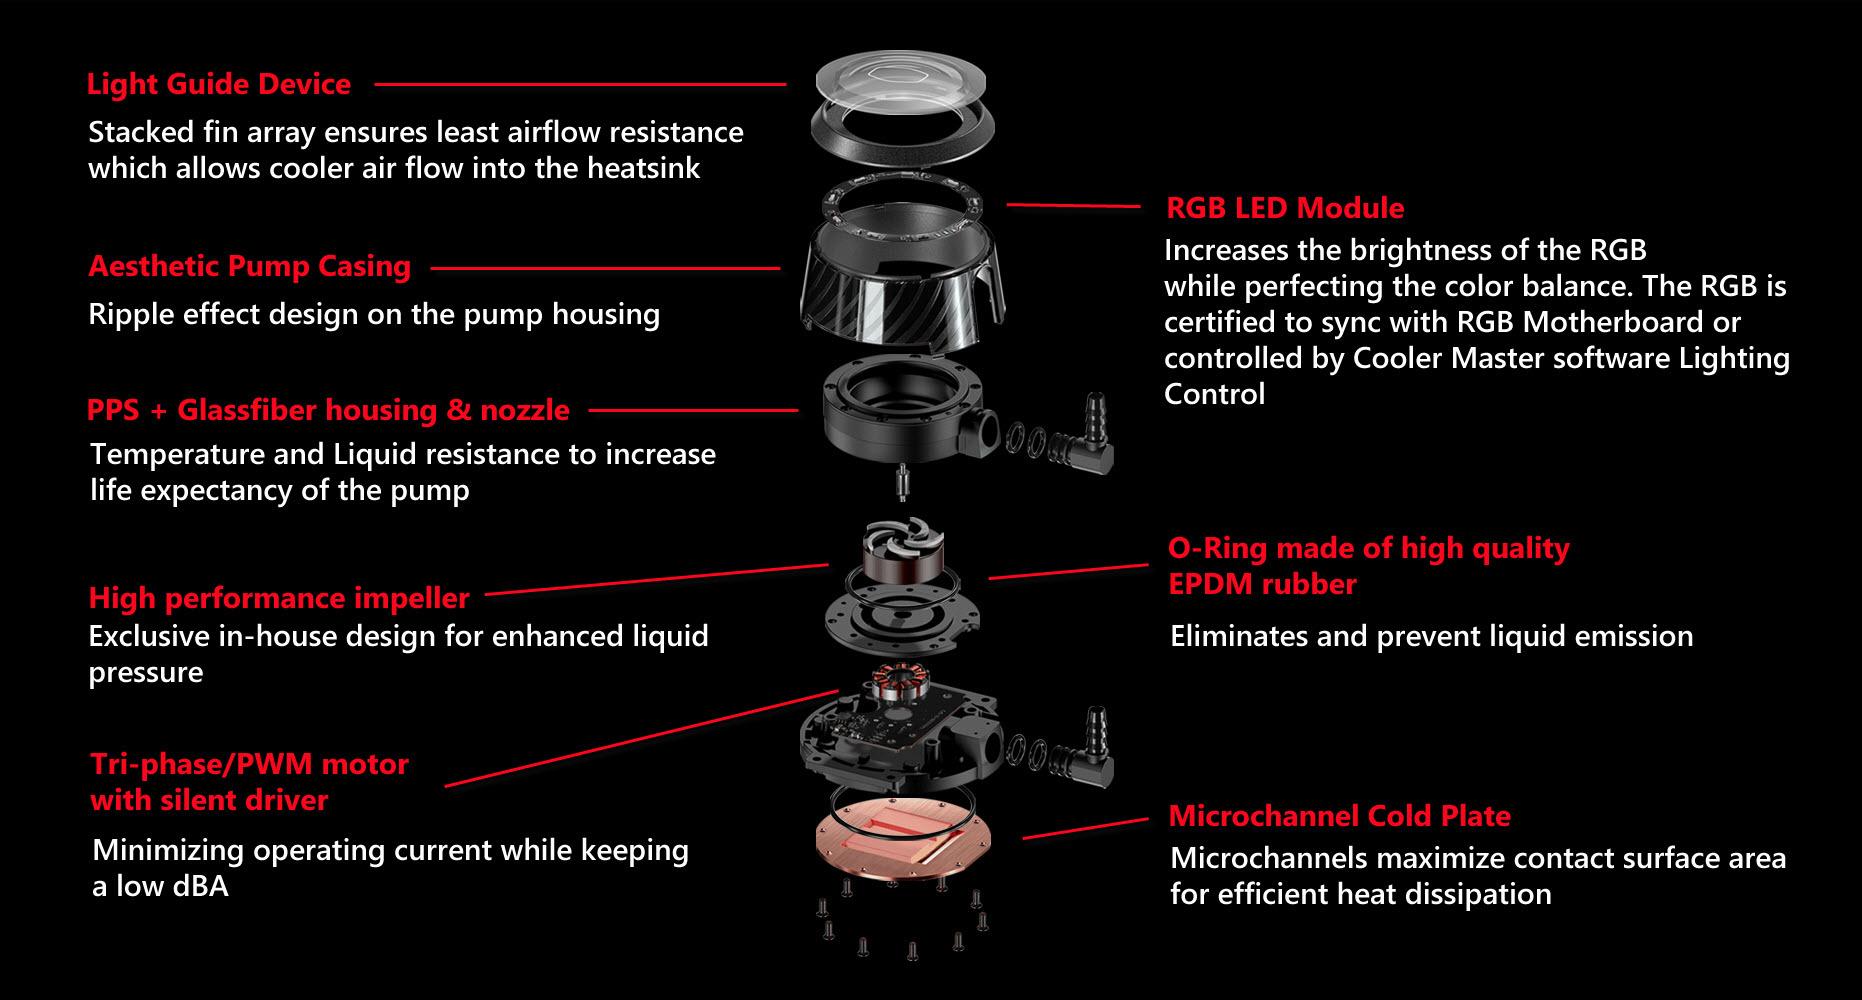 Cooler Master MasterLiquid ML240P Mirage Addressable RGB Close-Loop CPU  Liquid Cooler, Transparent Pump, 24 Independently-Controlled LEDS, Dual  120mm